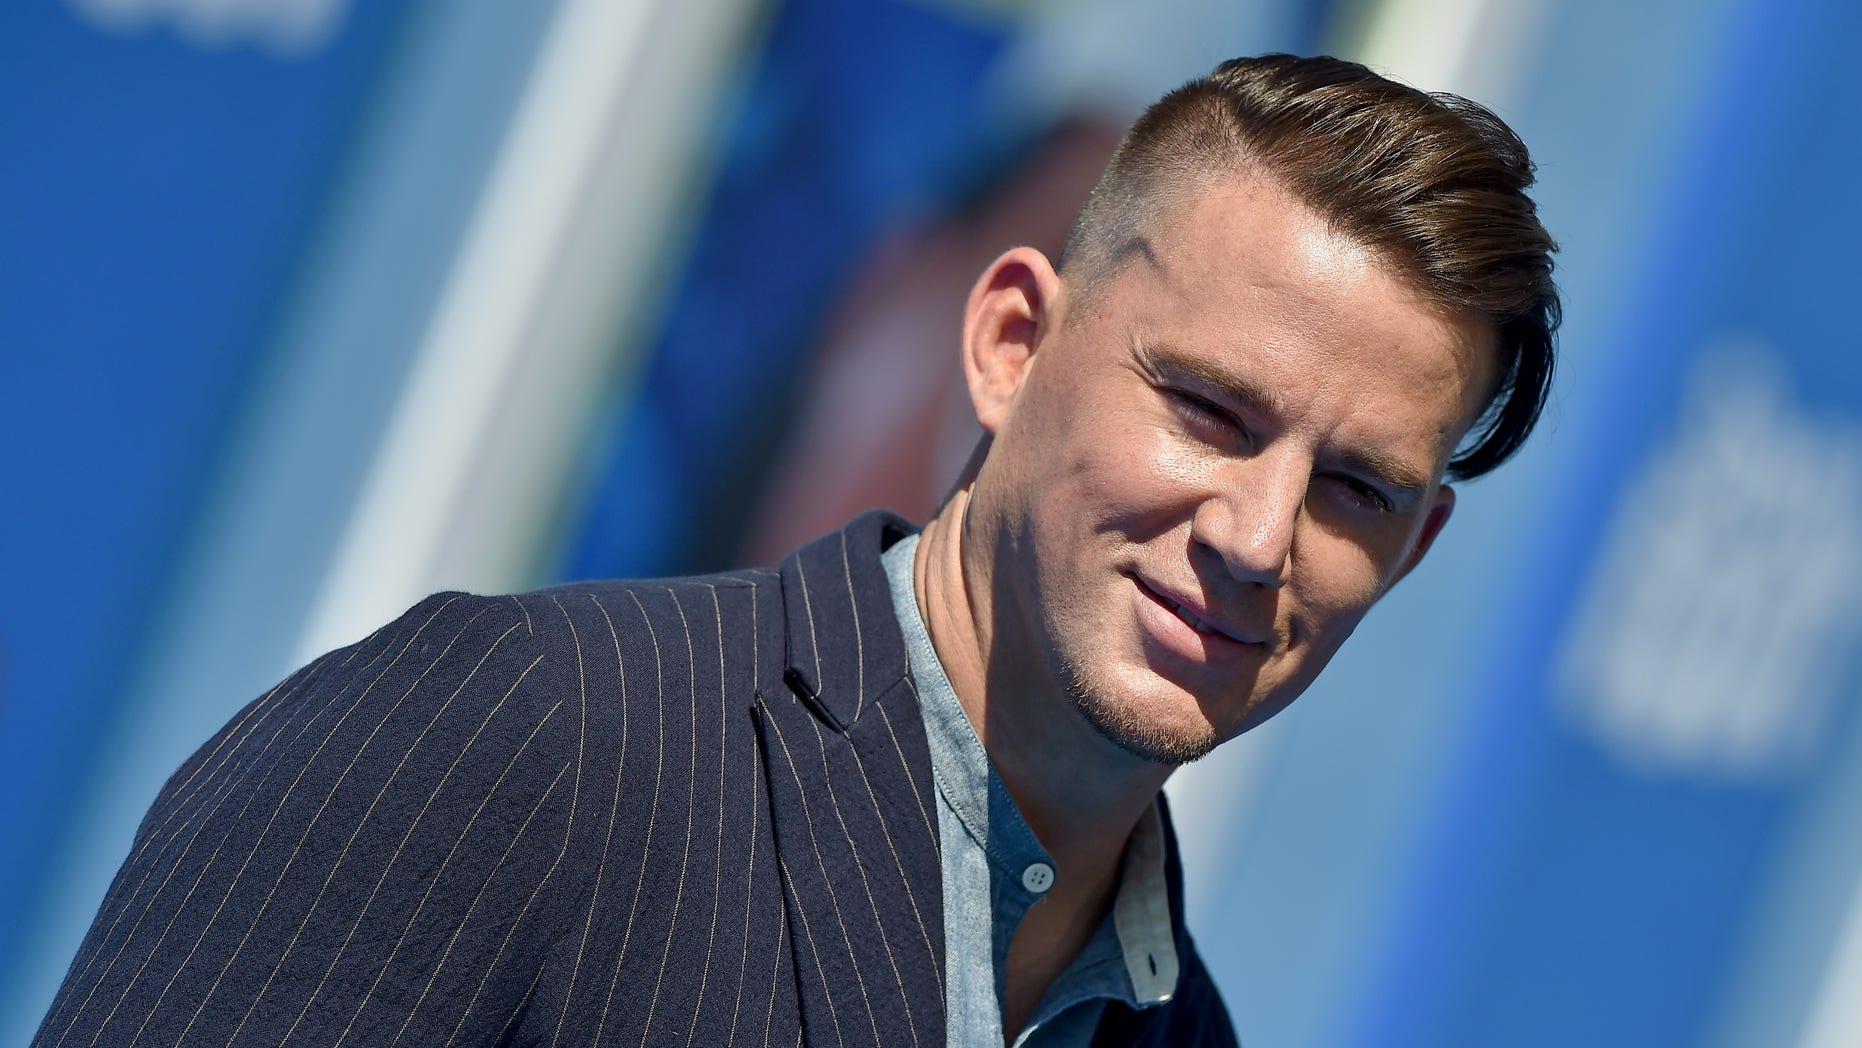 Channing Tatum Unveils New Blond Hair In Shirtless Selfie Gets Fans